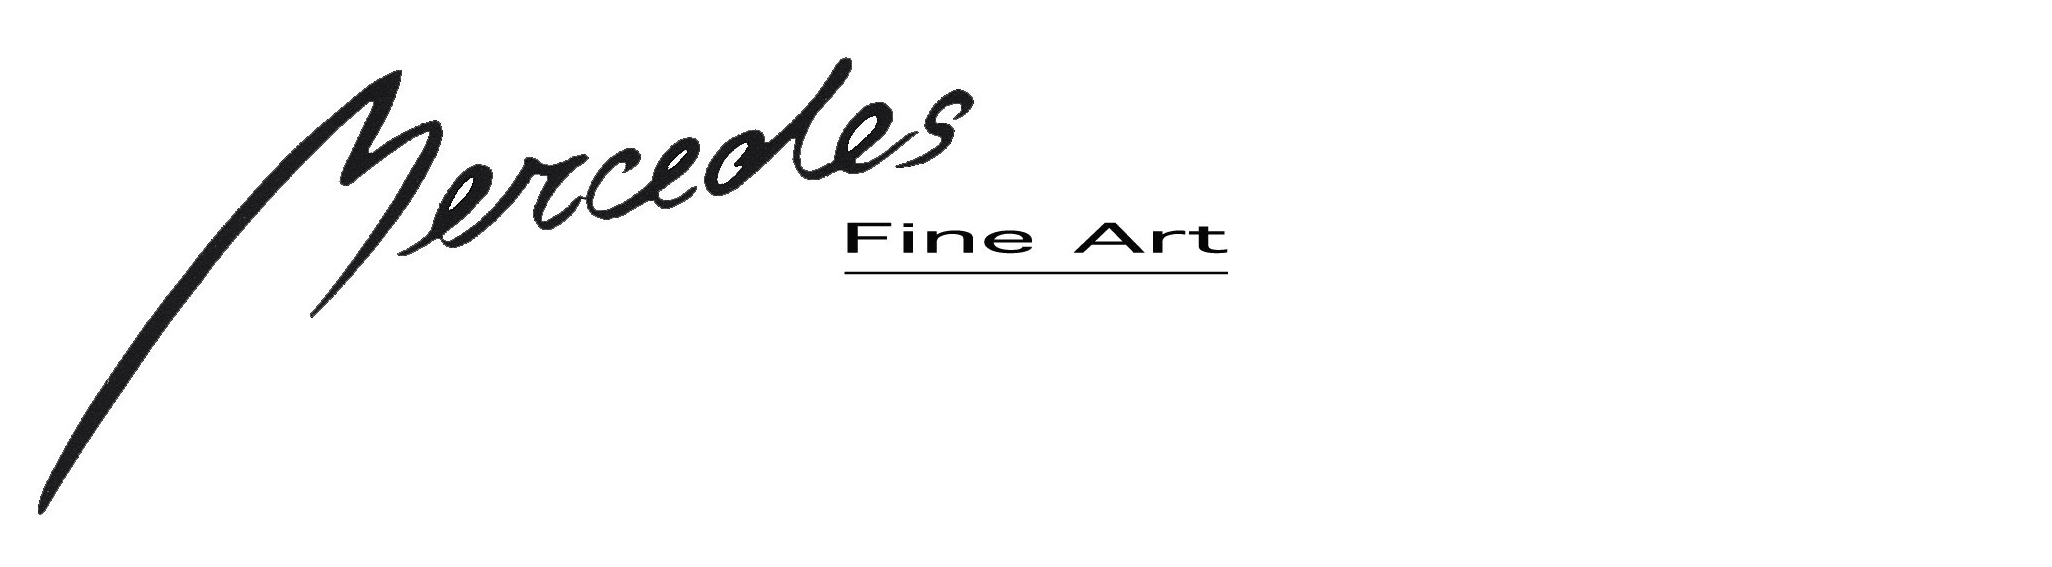 Mercedes Fine Art